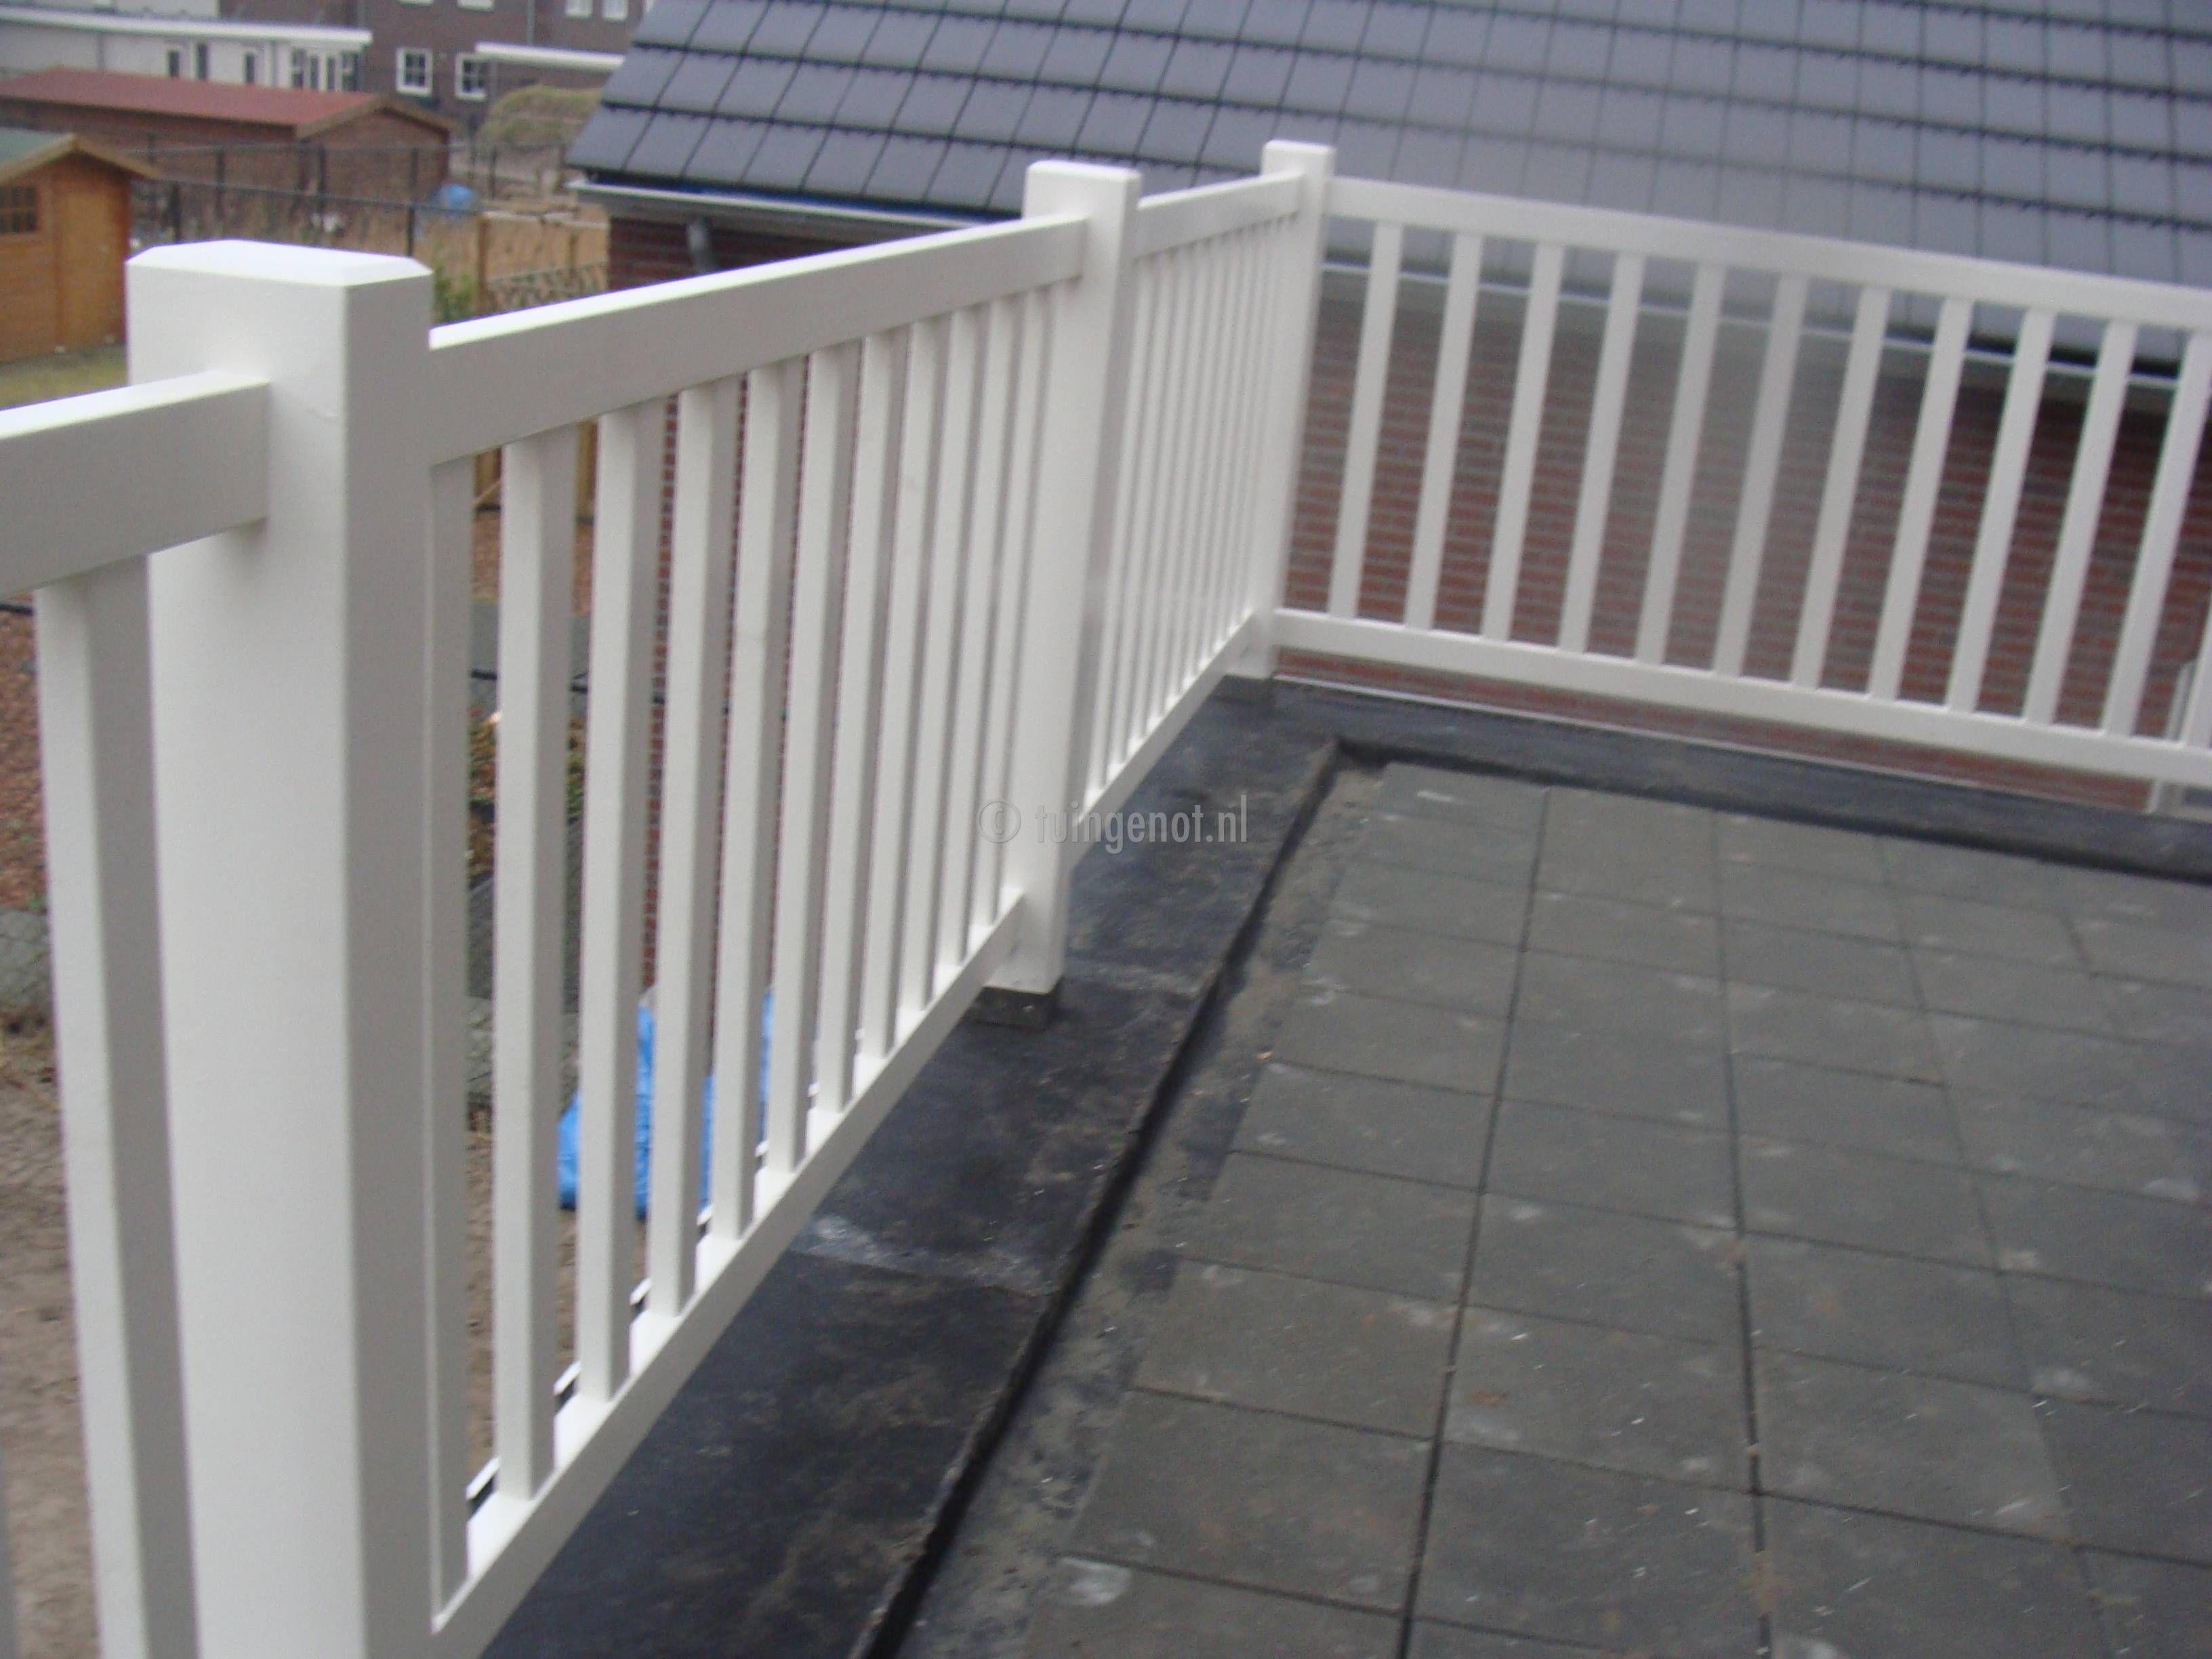 Houten Balkon Meubels : Balustrades voor een balkon balustrade balkon dakterras